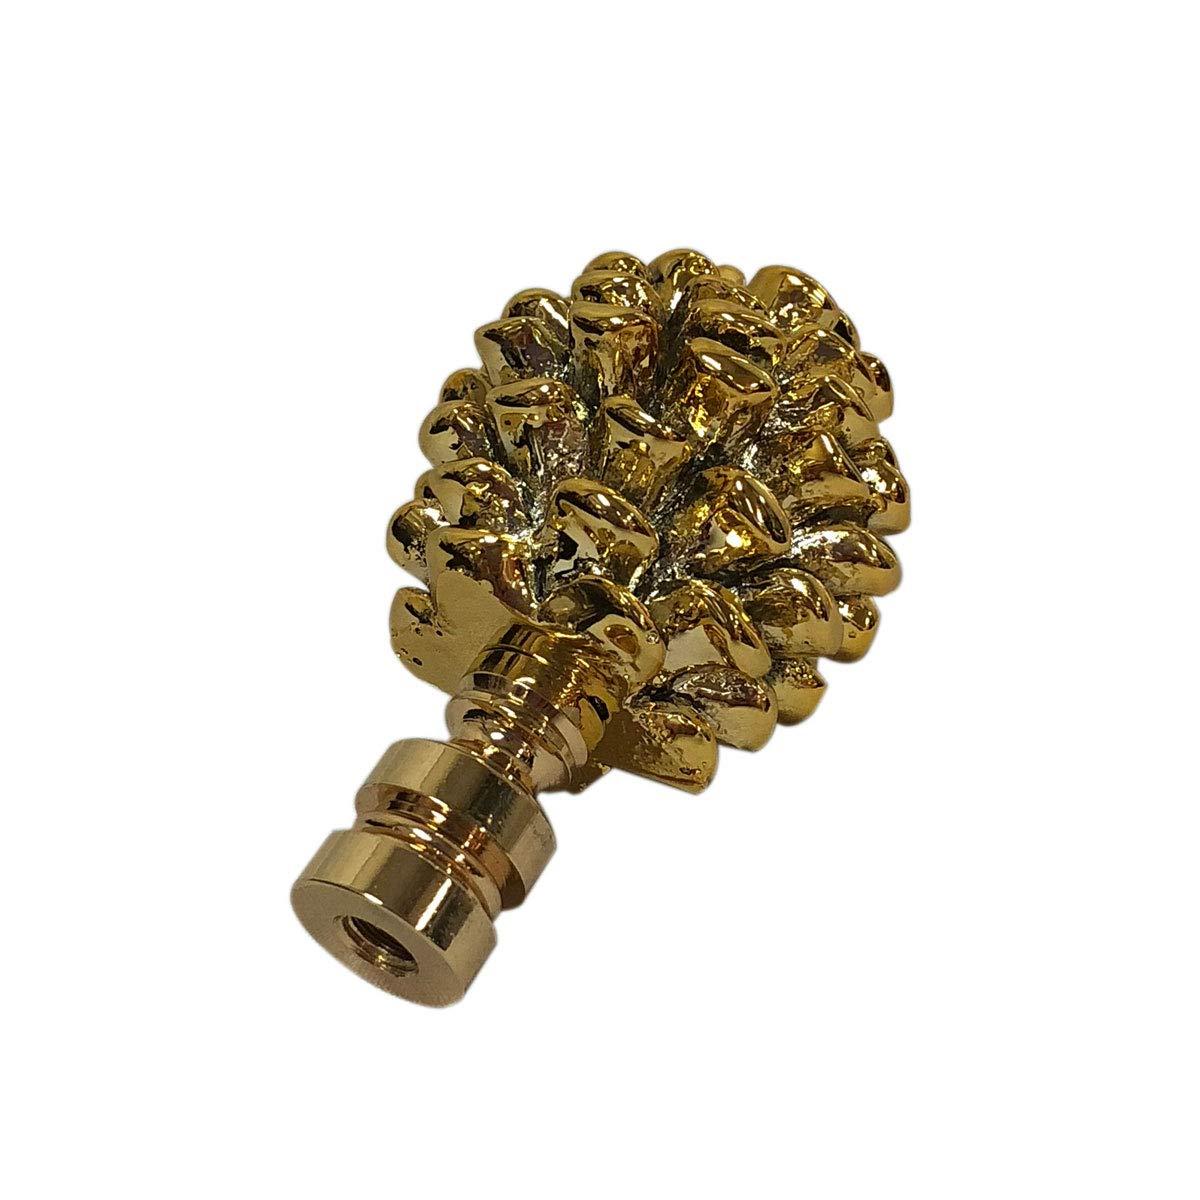 Antique Brass Royal Designs F-5064AB-2 Pine Cone Design Lamp Finial Set of 2